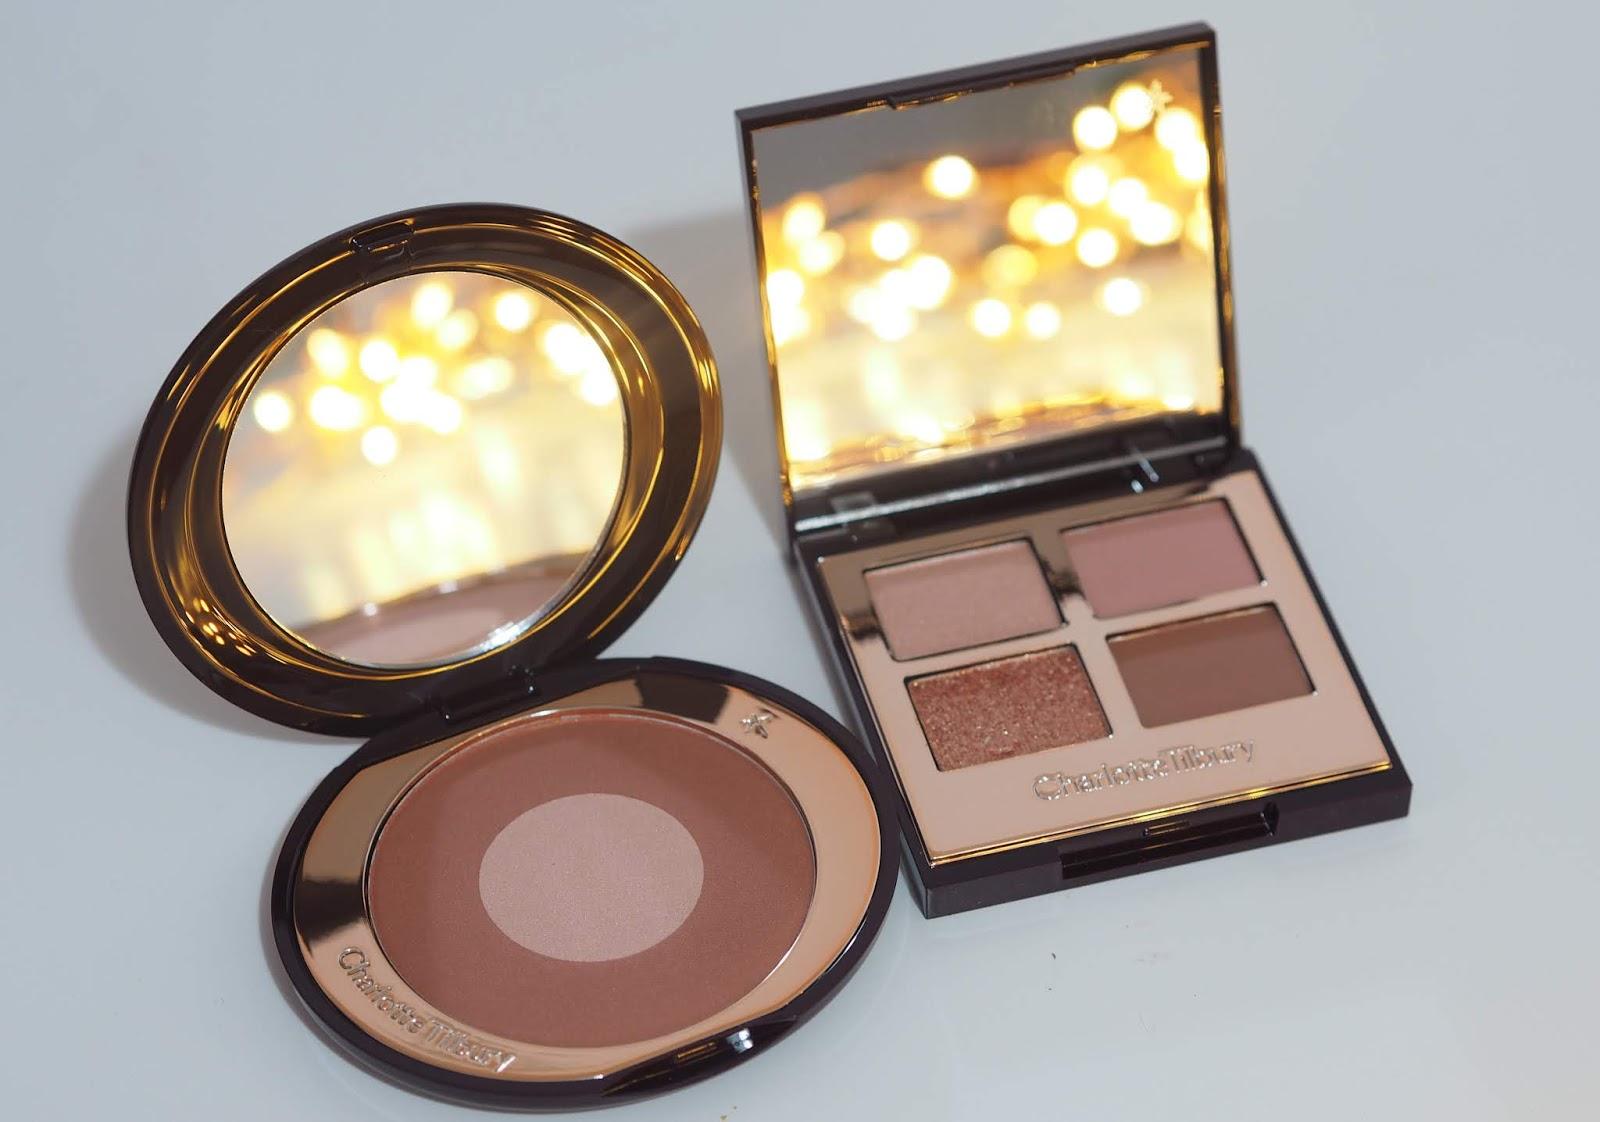 6d2bfc38f7cf Charlotte Tilbury Pillow Talk Eyeshadow palette & blush review, photos,  swatches | Lovely Girlie Bits | Bloglovin'